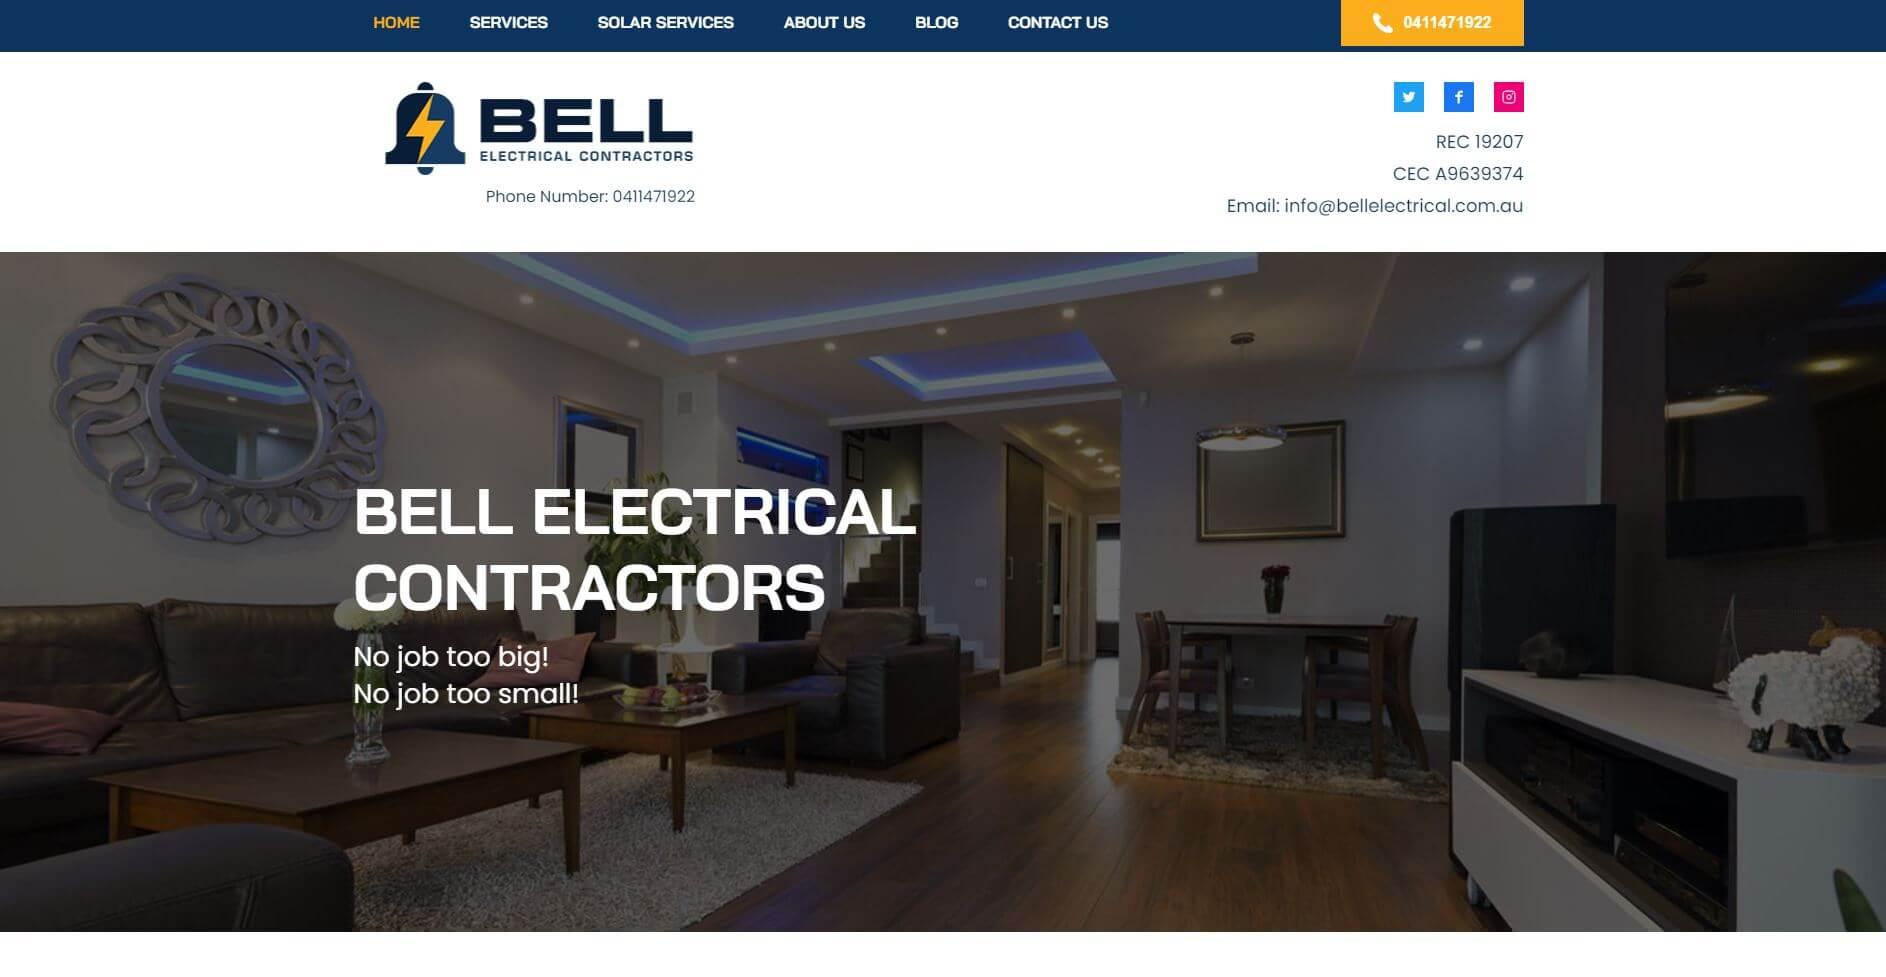 Bell Electrical Contractors